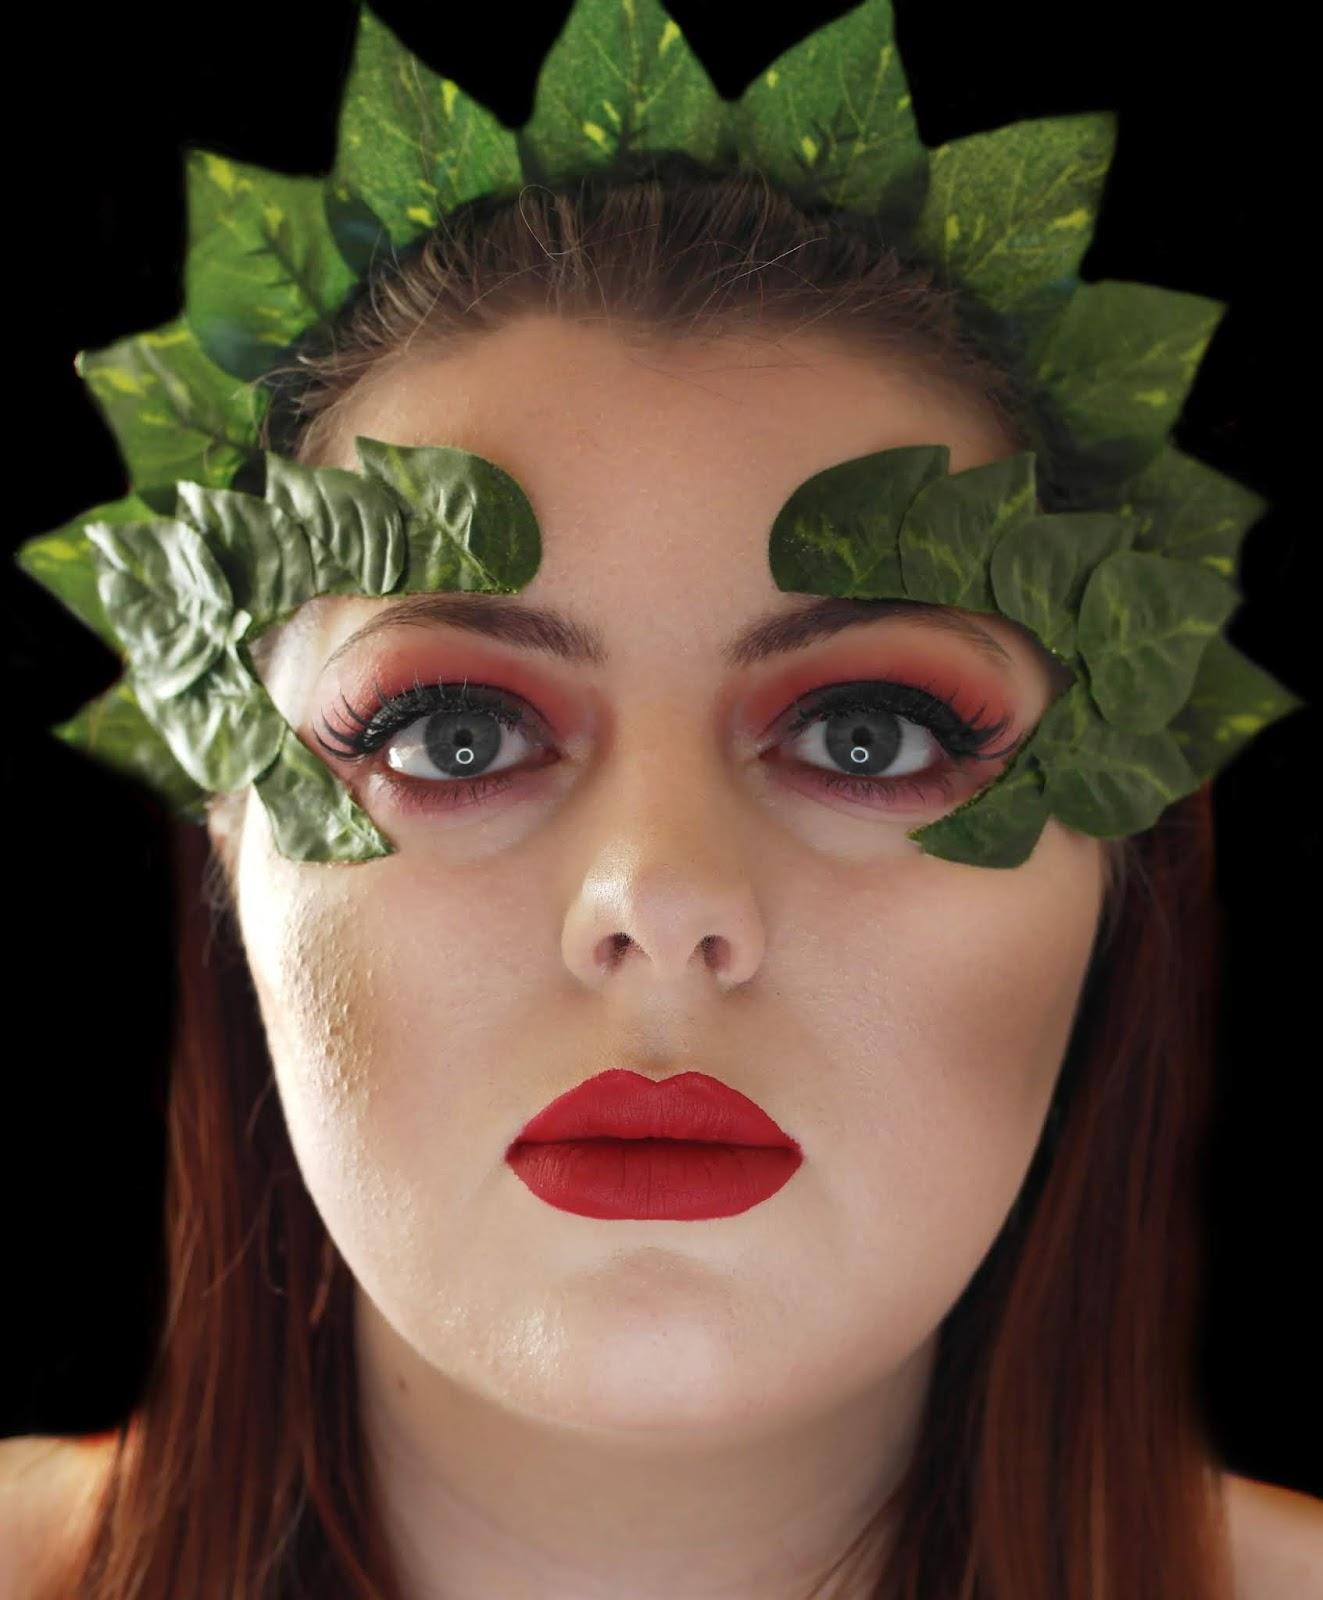 POISON IVY COSTUME EYE MASK FANCY DRESS GREEN GLITTER EYEBROW COSPLAY HALLOWEEN